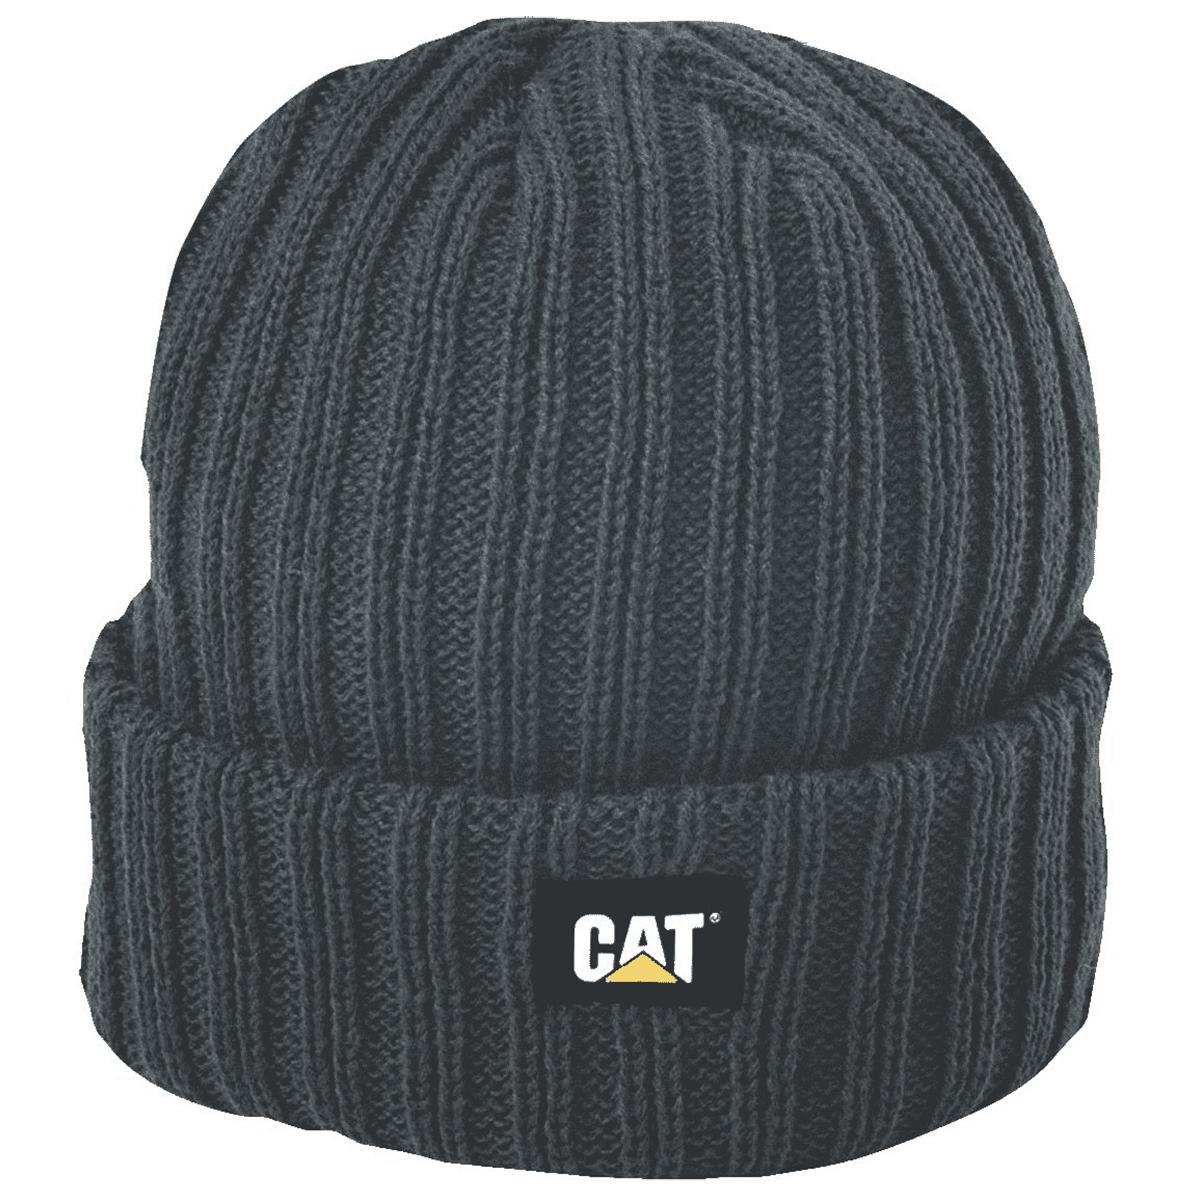 CAT Muts Graphitte Grijs